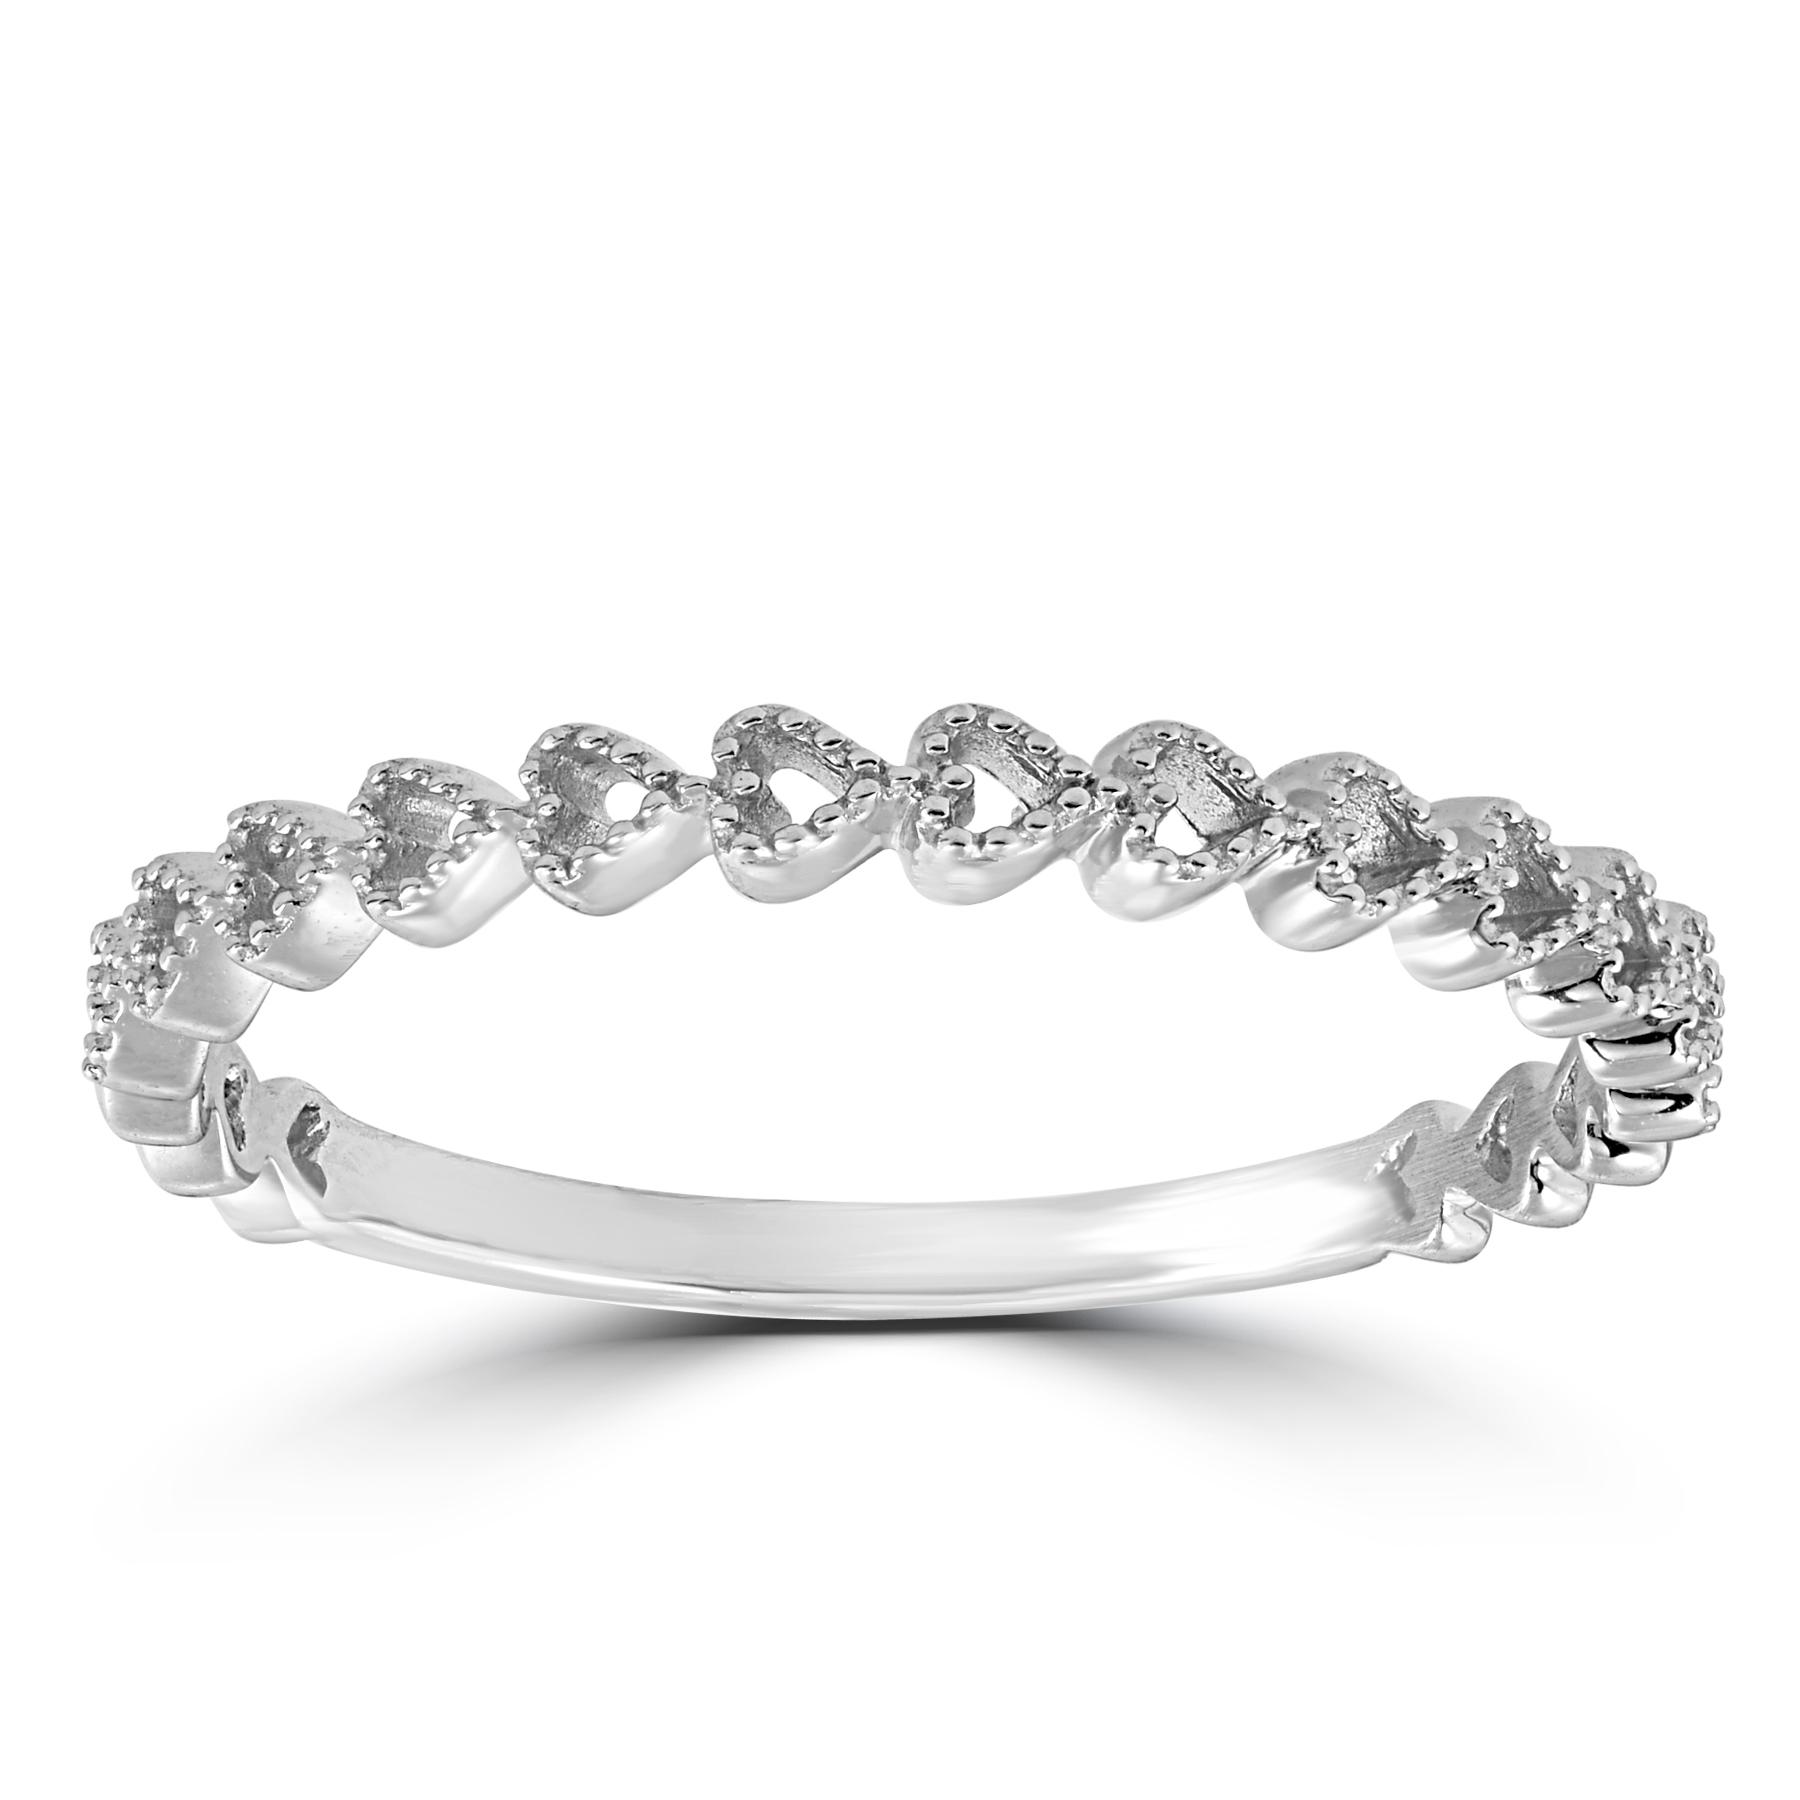 14k White Gold Heart Shape Stackable Womens Ring Wedding